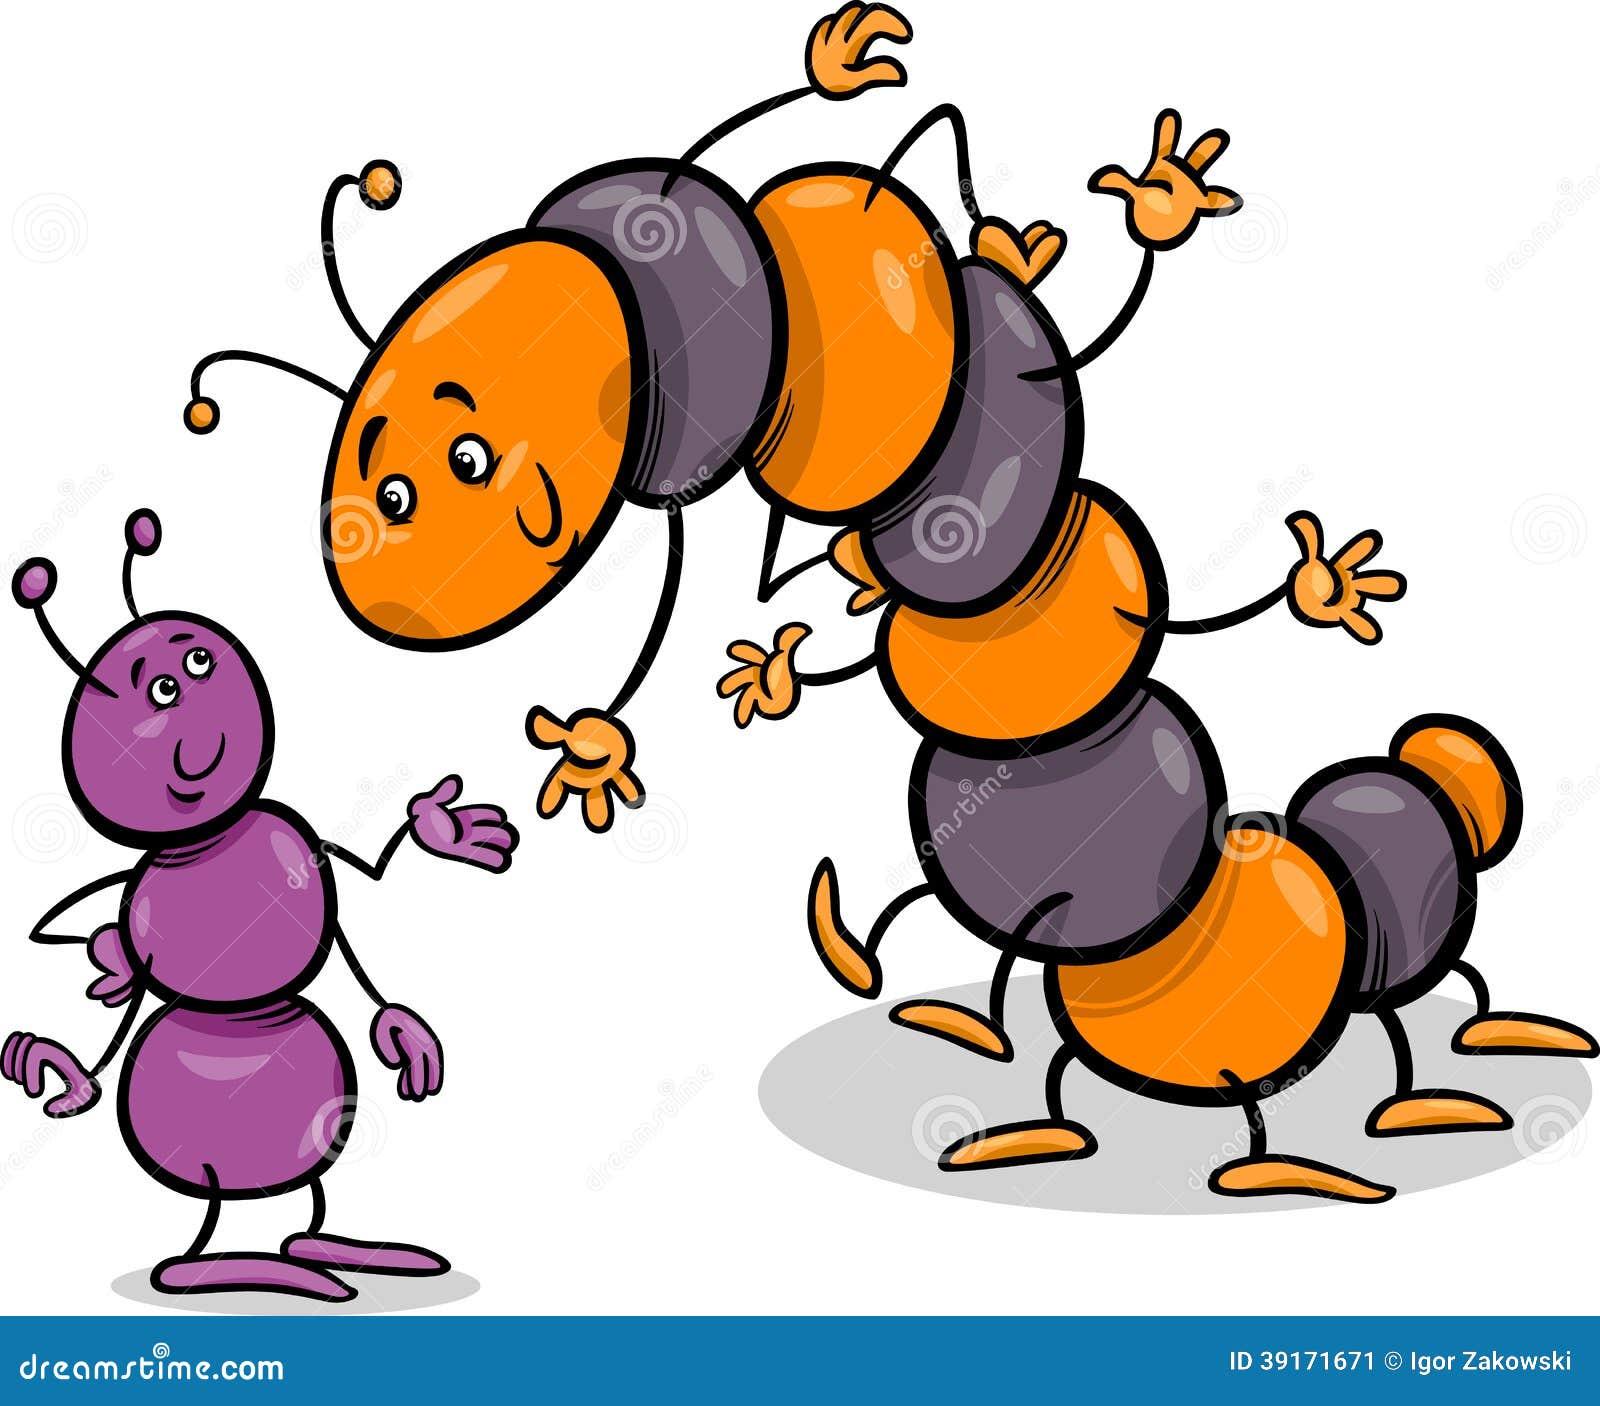 Caterpillar cartoon bugs vector illustration